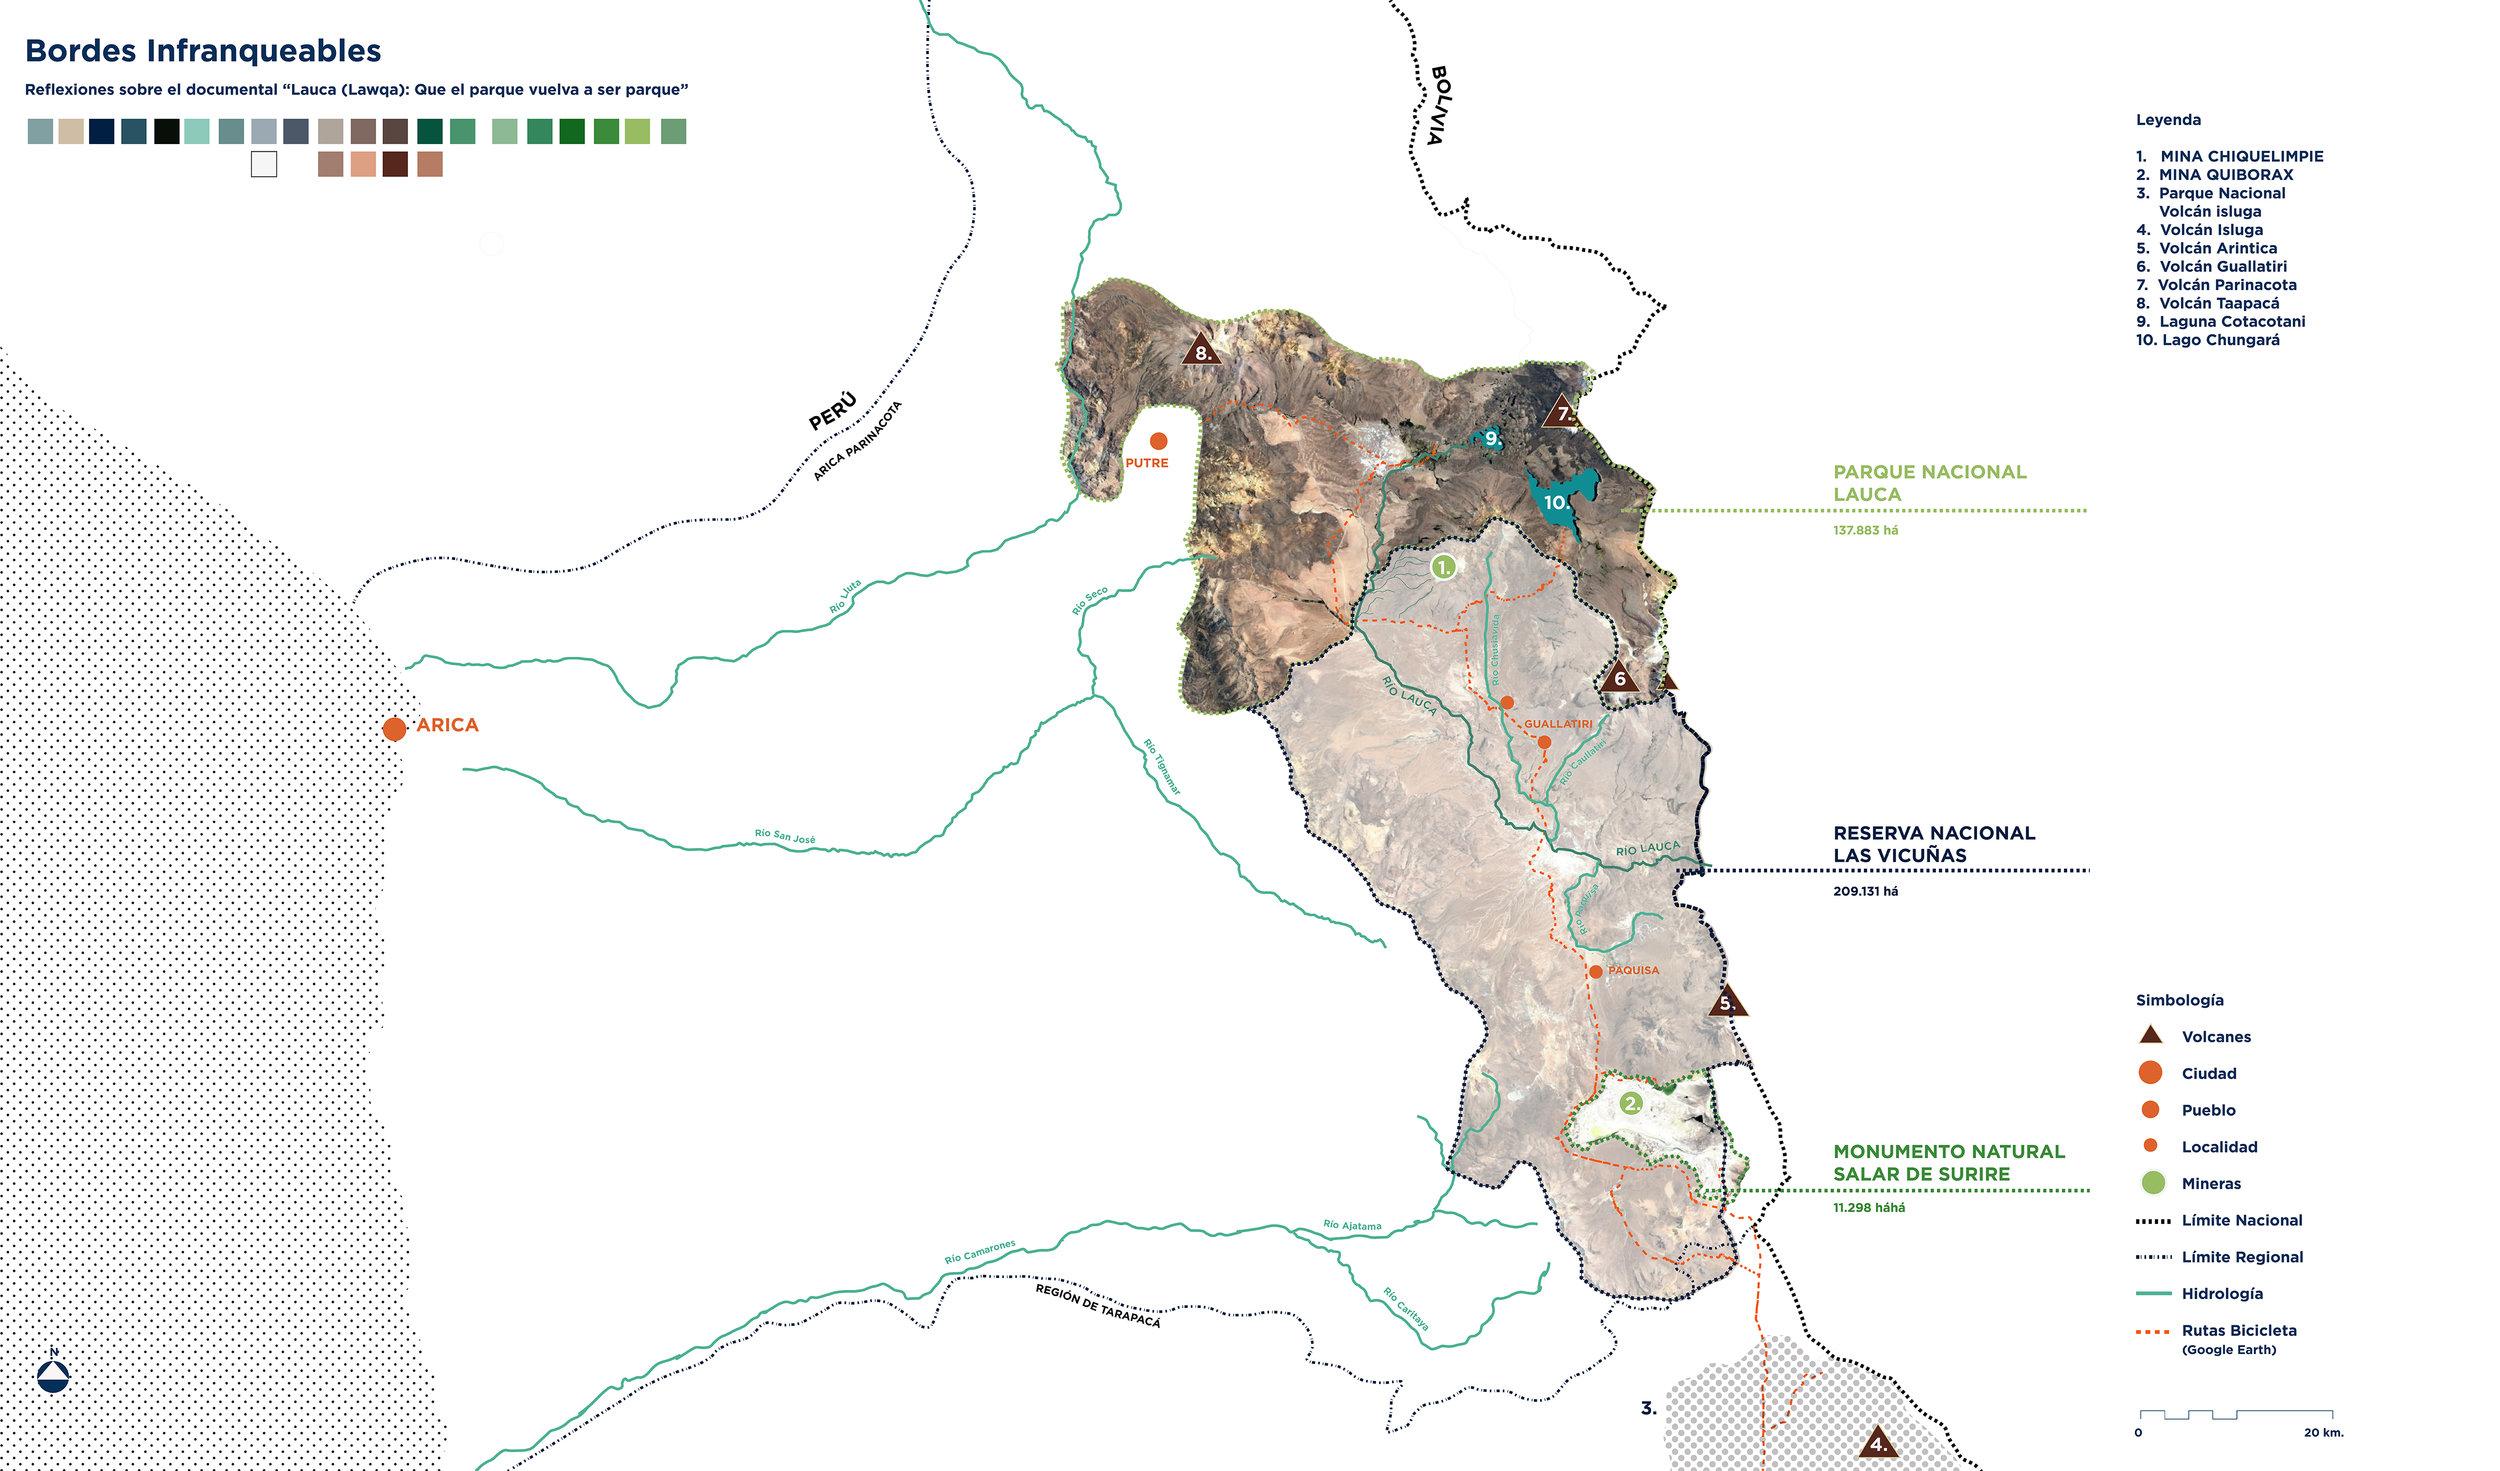 MAPA Cilcoruta 1(7) Mapa Bordes Infranqueables  © Francisca Salas para LOFscapes